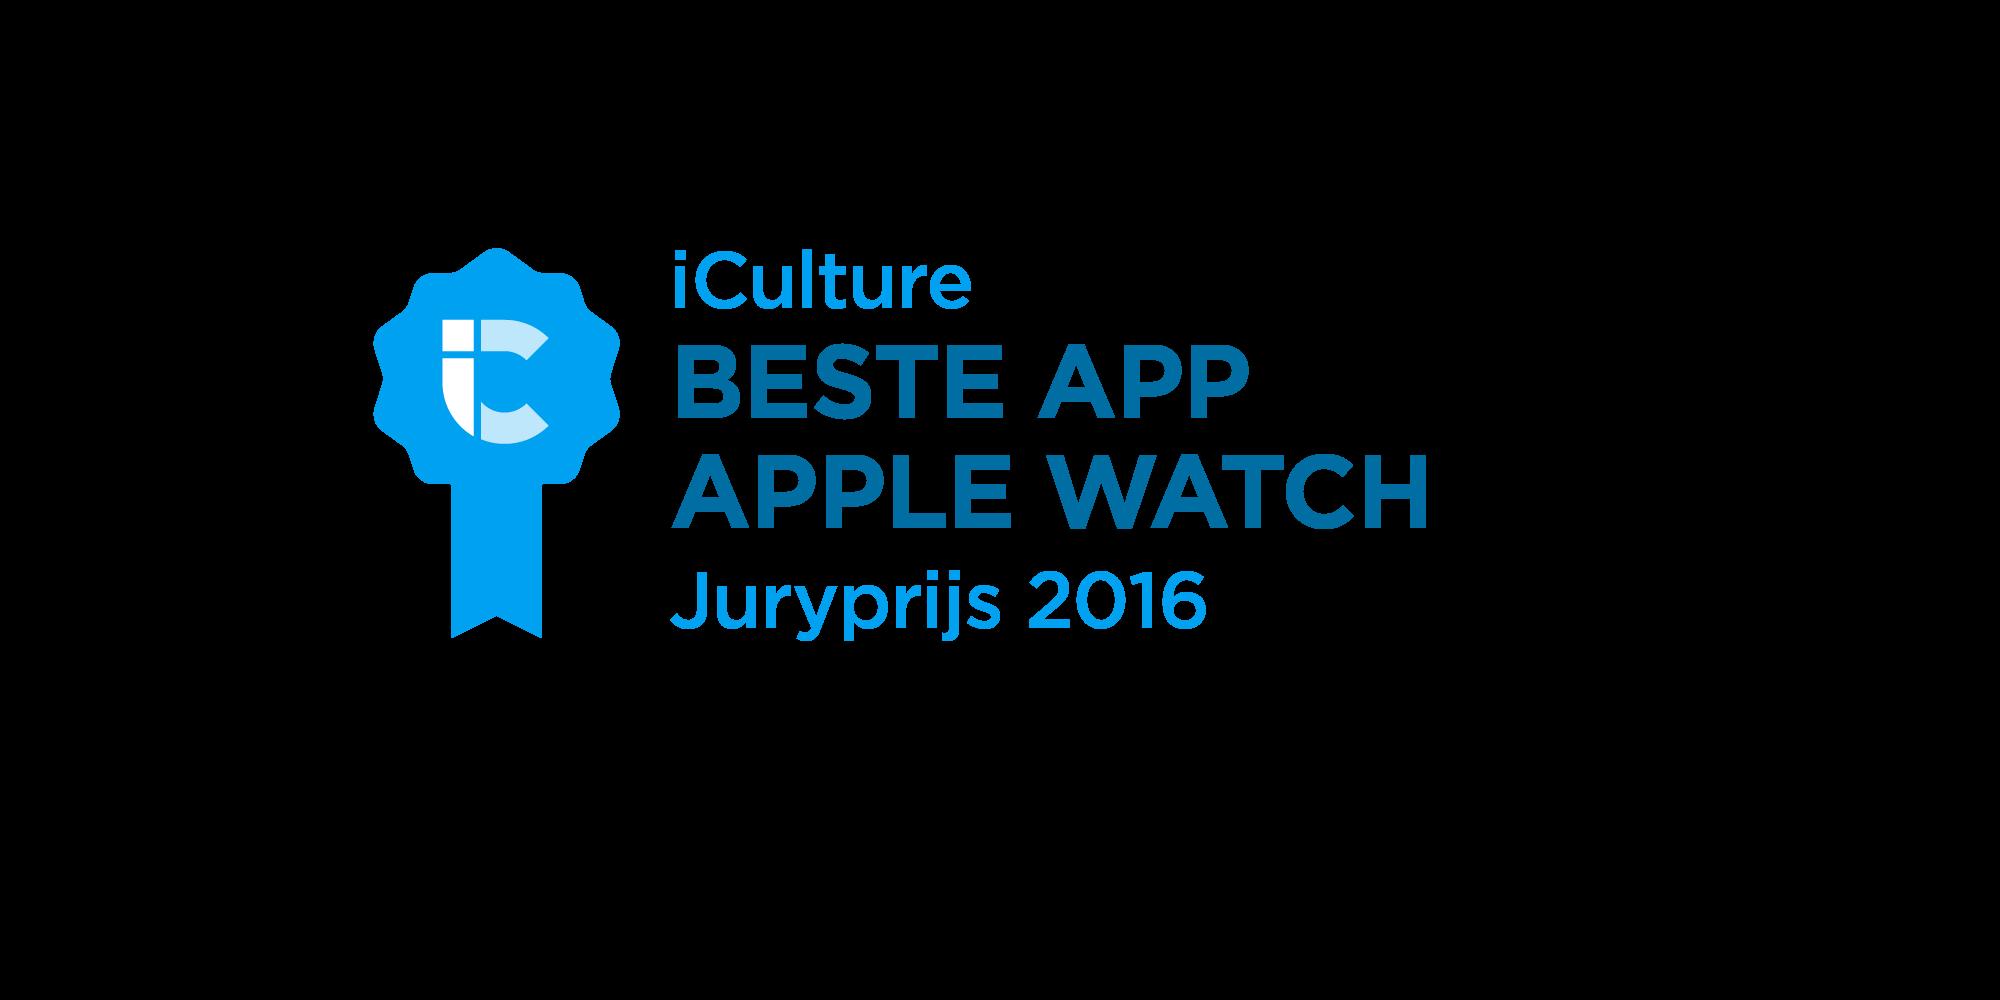 iCulture Beste Apple Watch-app 2016